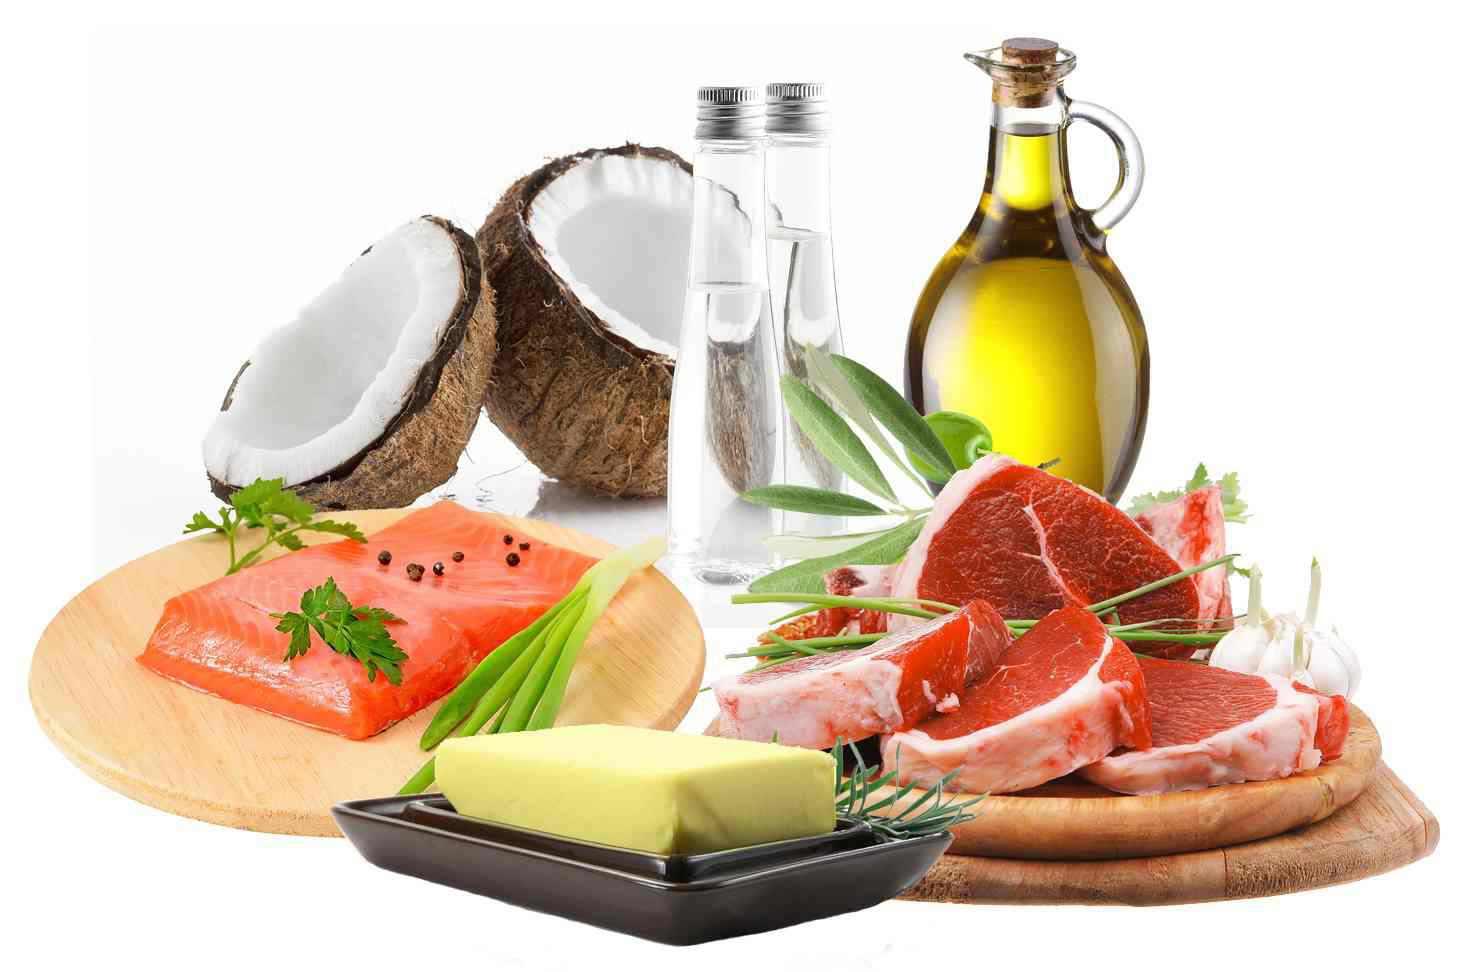 zayiflama-diyet-programi (8)